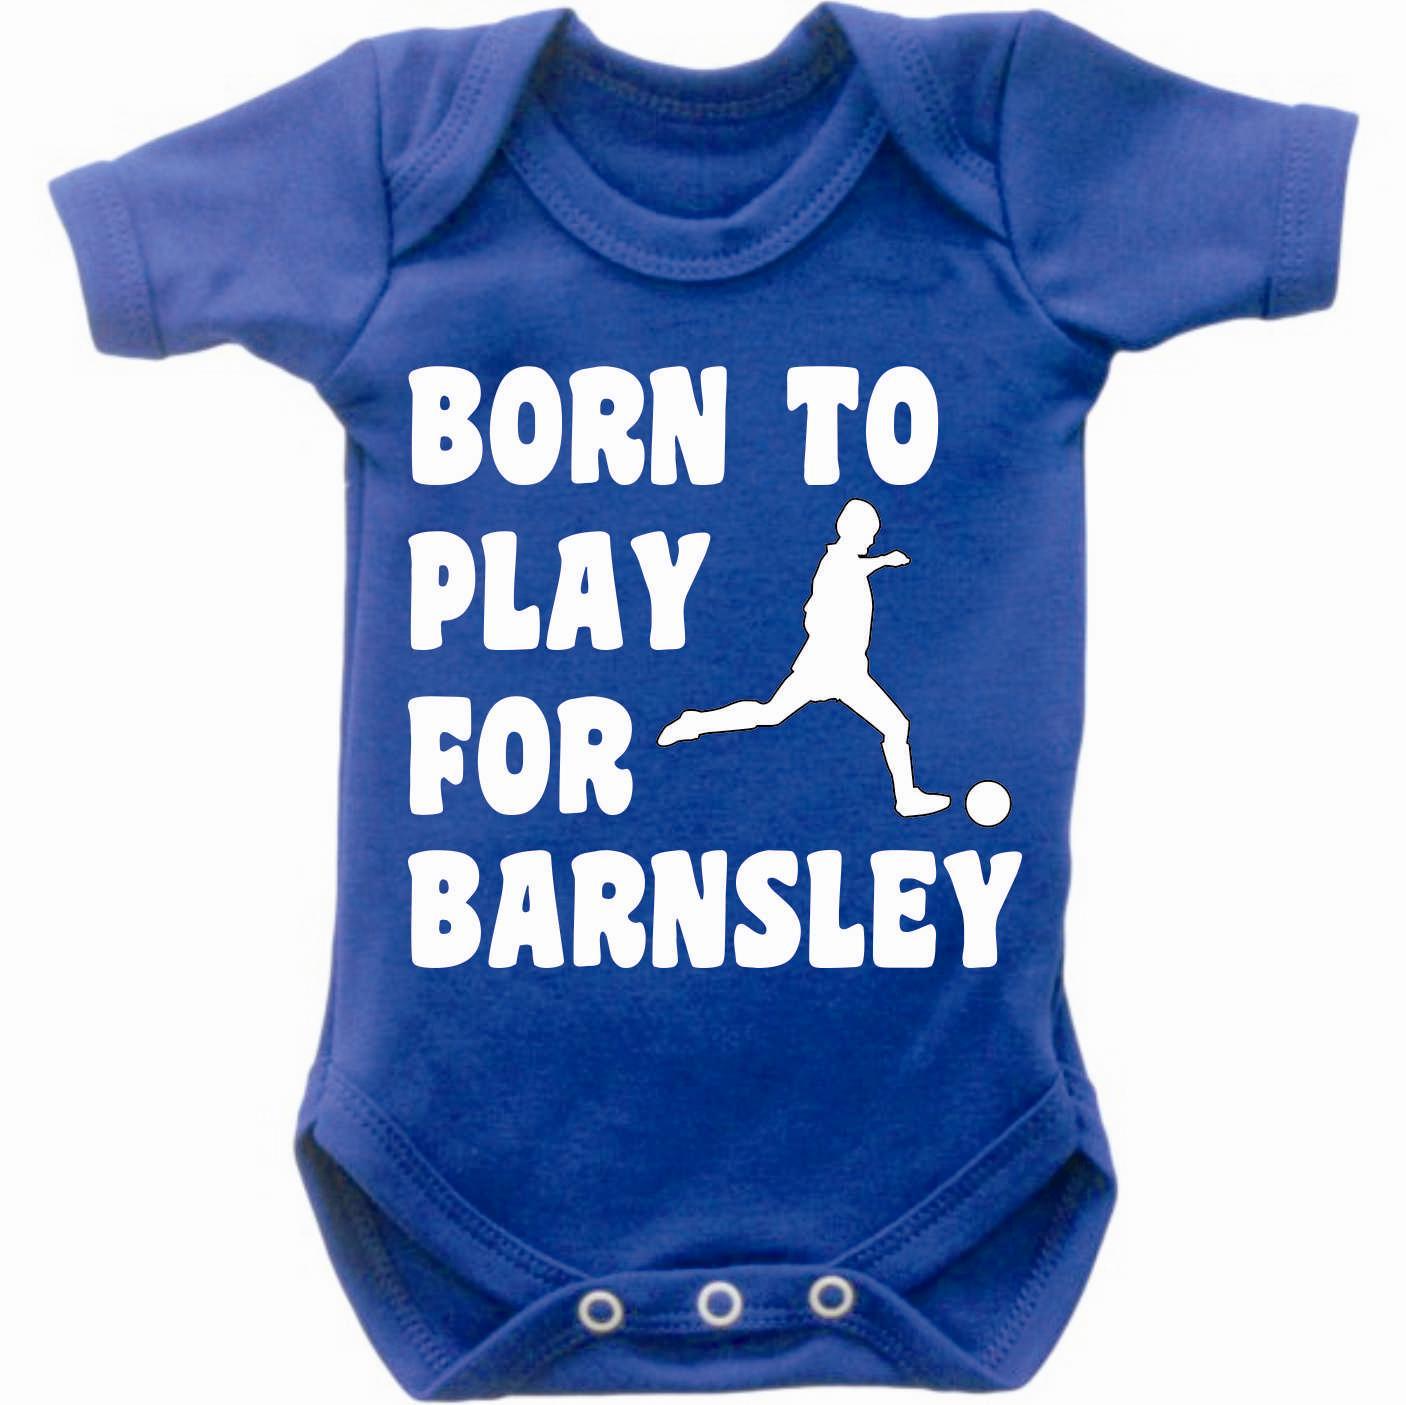 Born-To-Play-Football-For-Barnsley-Baby-Grow-Bodysuit-Romper-Vest